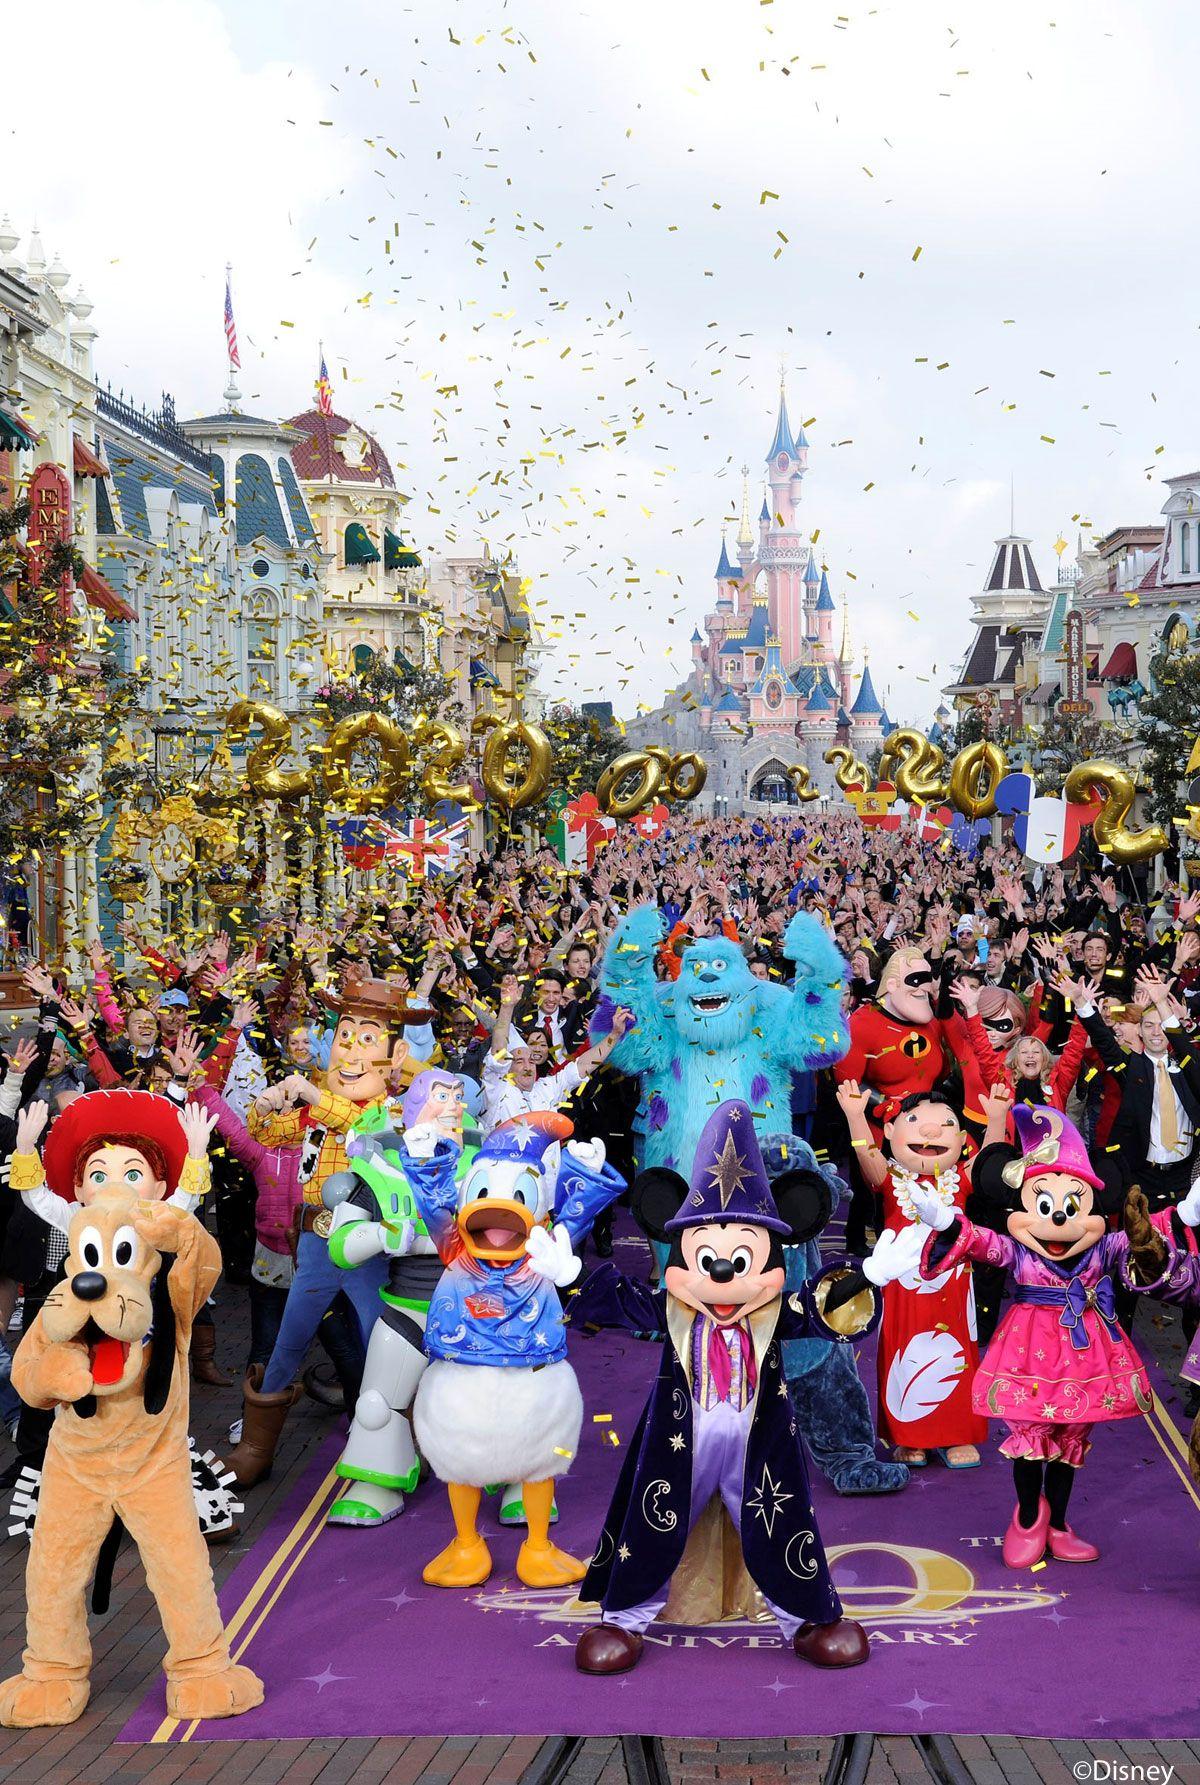 20 Geburtstag Disneyland Paris Disneyland Paris Disneyland